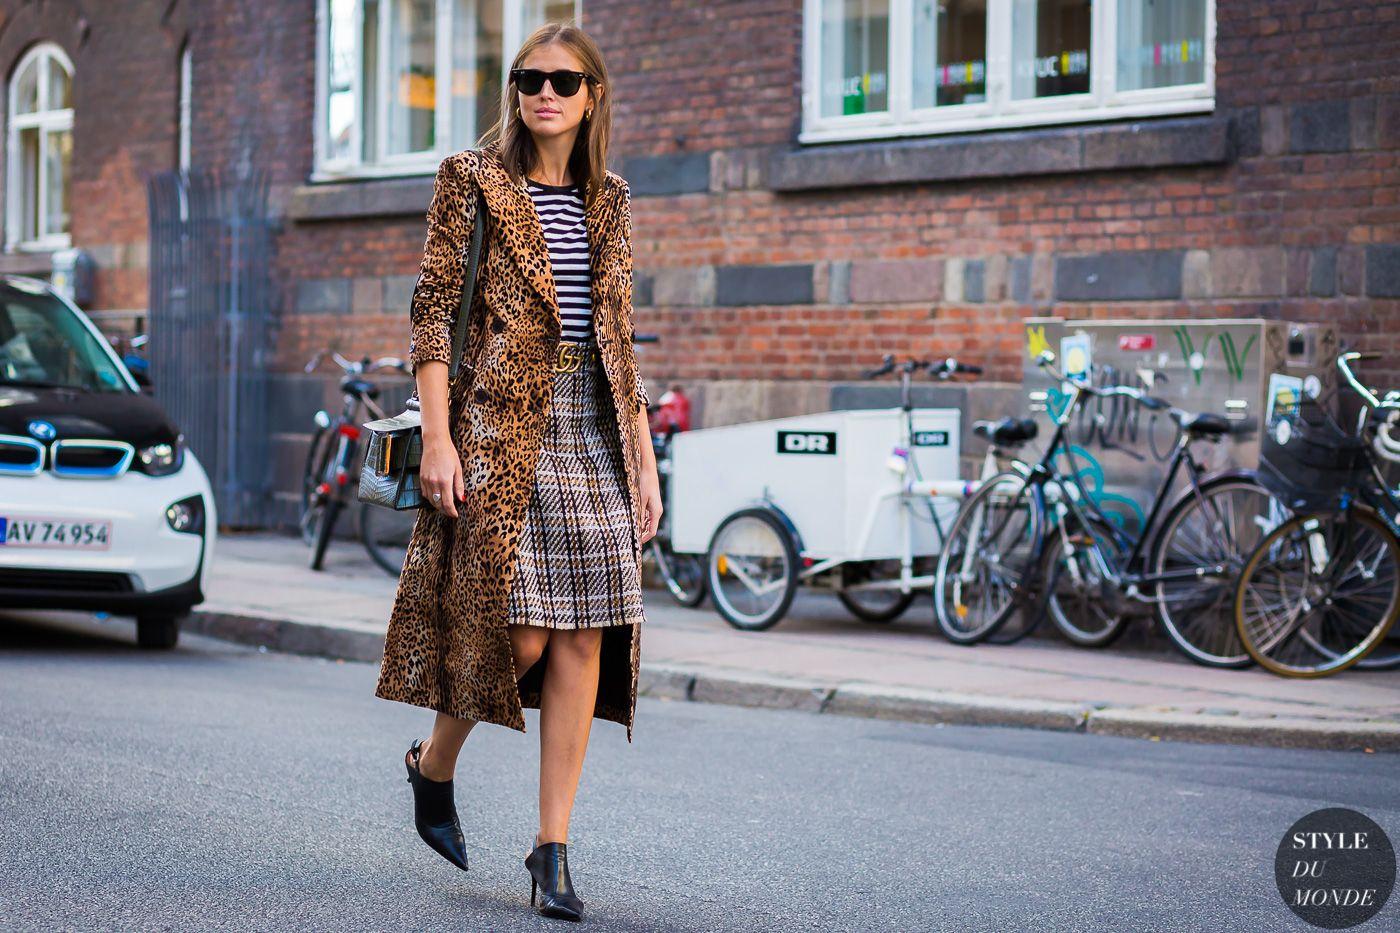 Darja Barannik by STYLEDUMONDE Street Style Fashion Photography0E2A1248